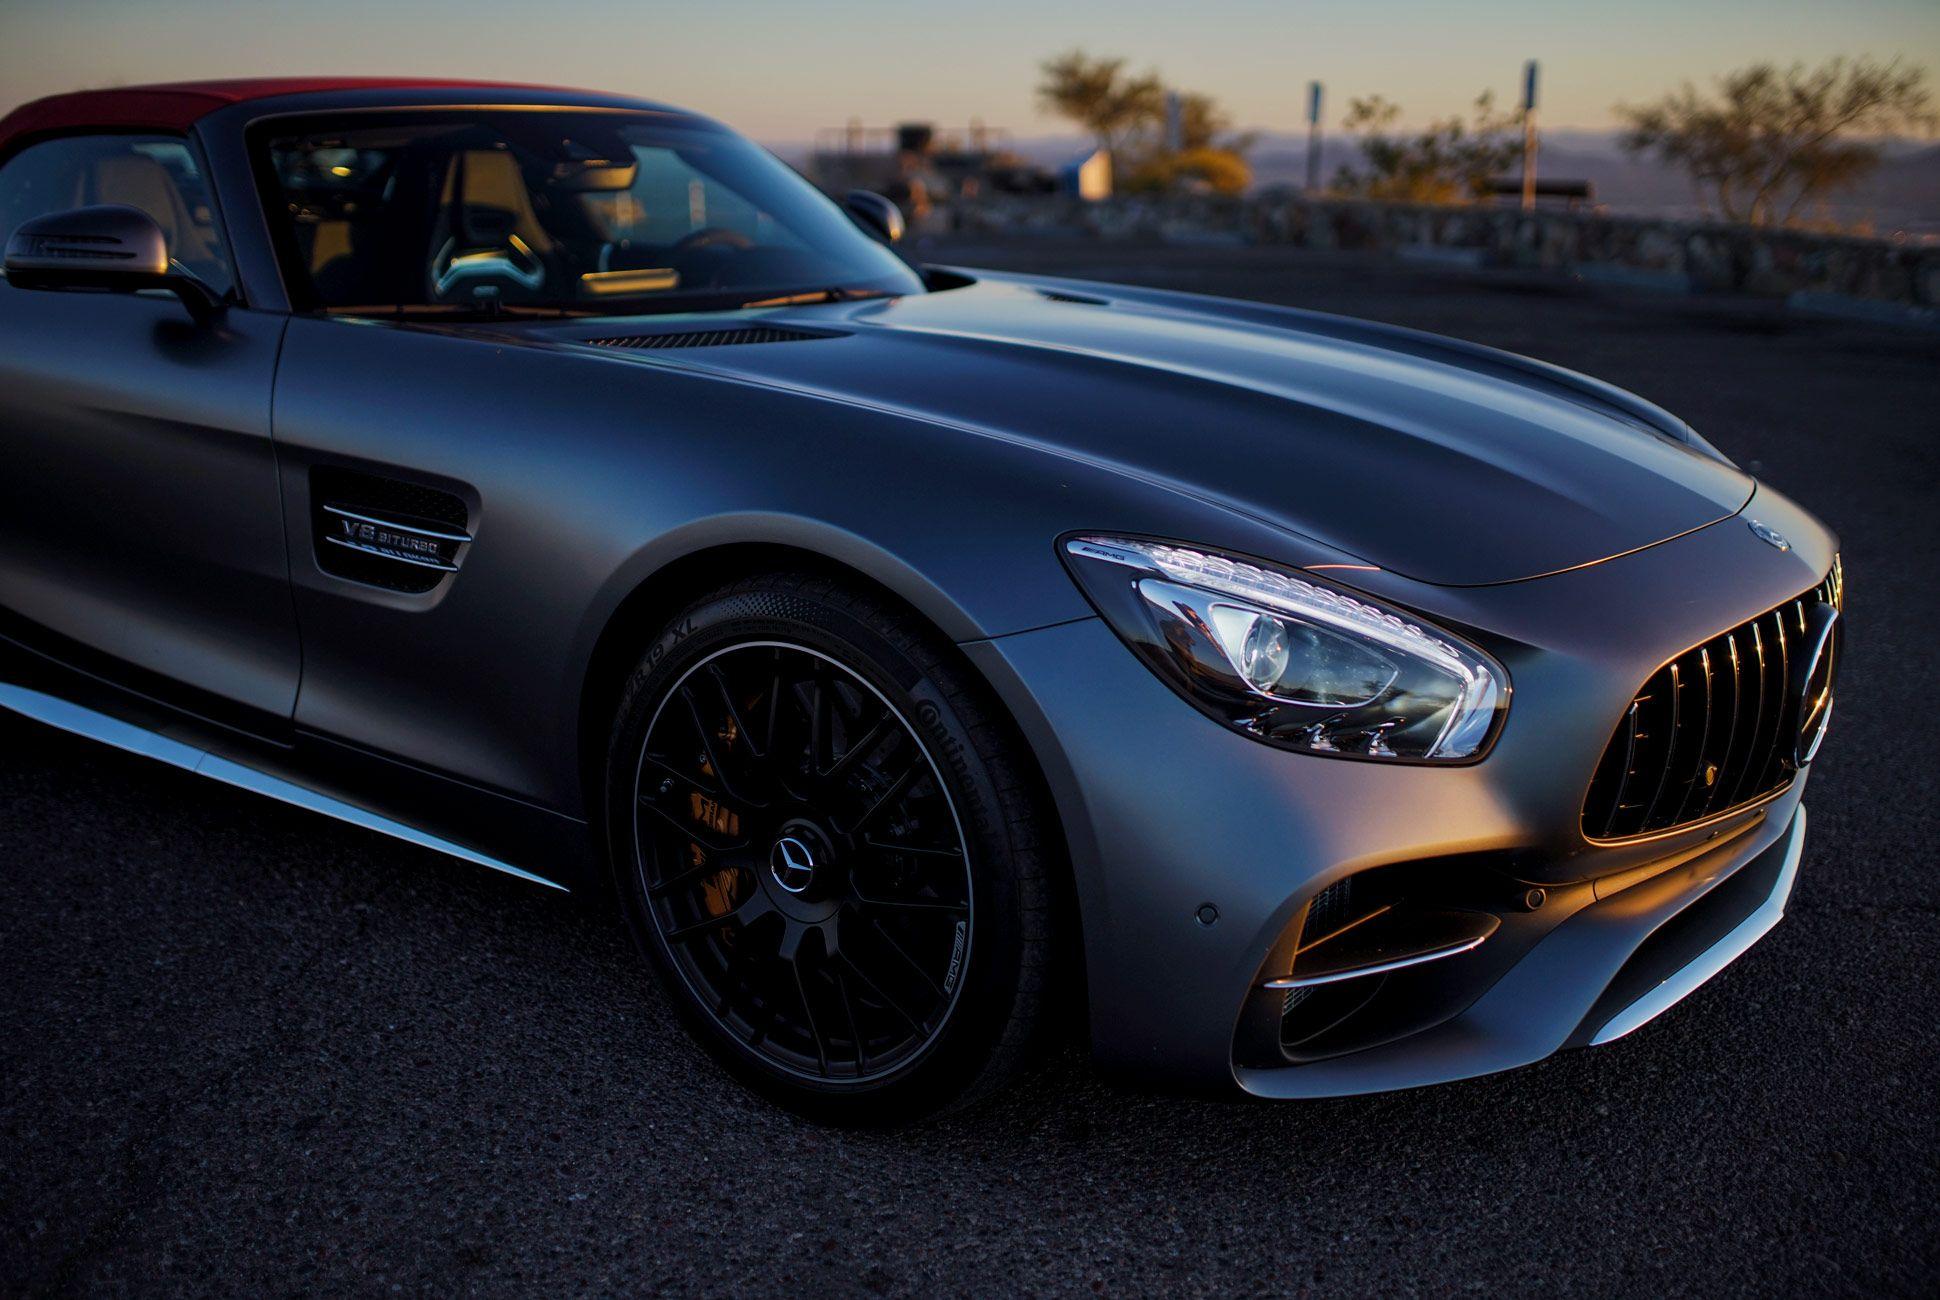 Mercedes-Benz-AMG-GT-C-Gear-Patrol-Ambiance-Slide-2